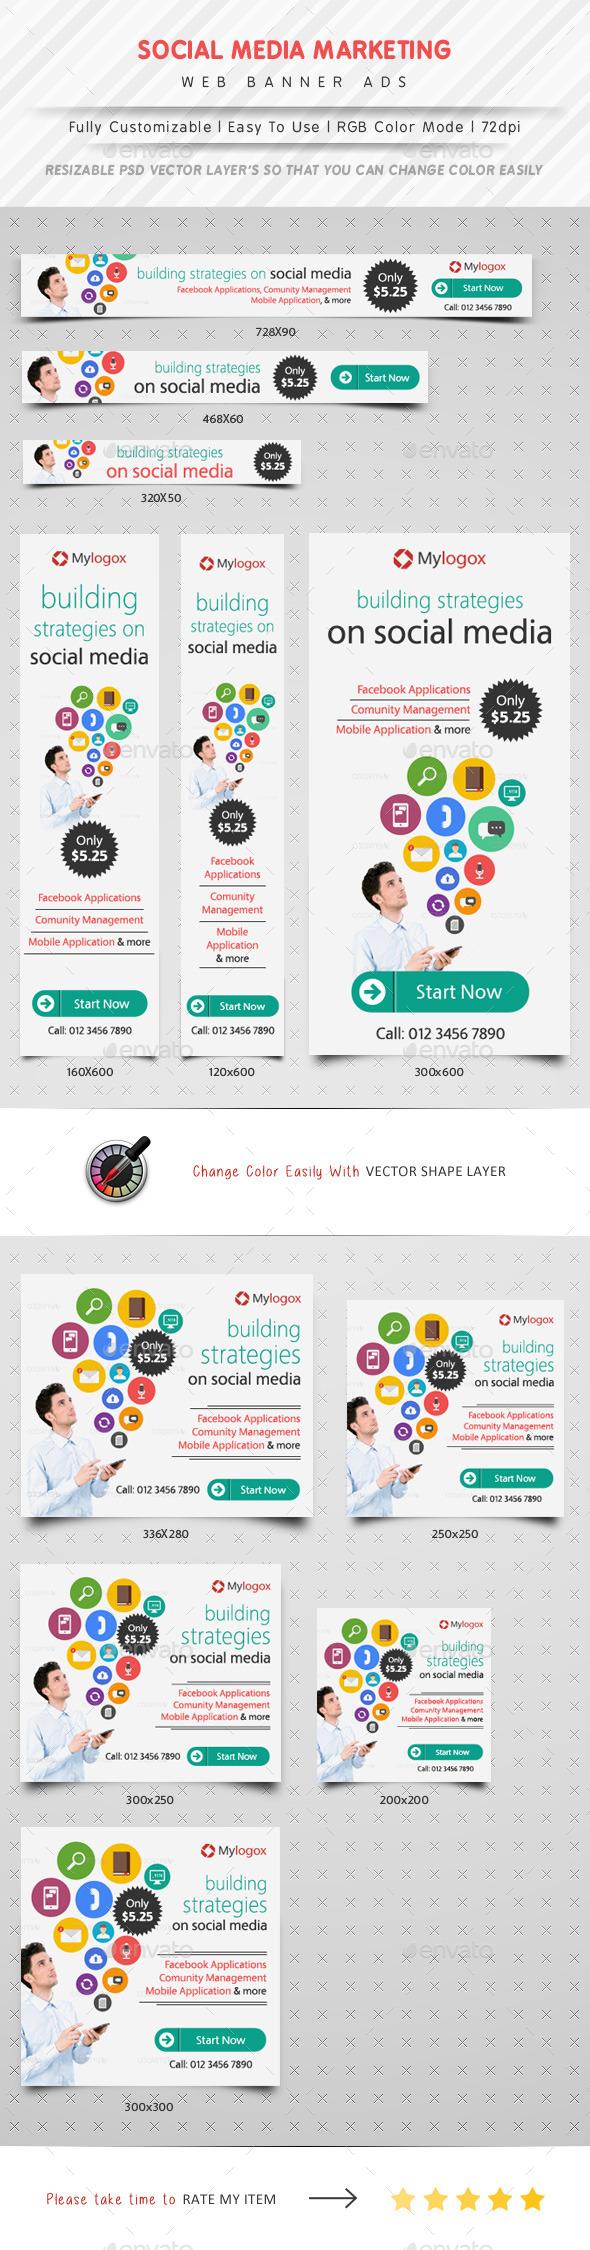 GraphicRiver Social Media Marketing Web Banner Ads 11366290